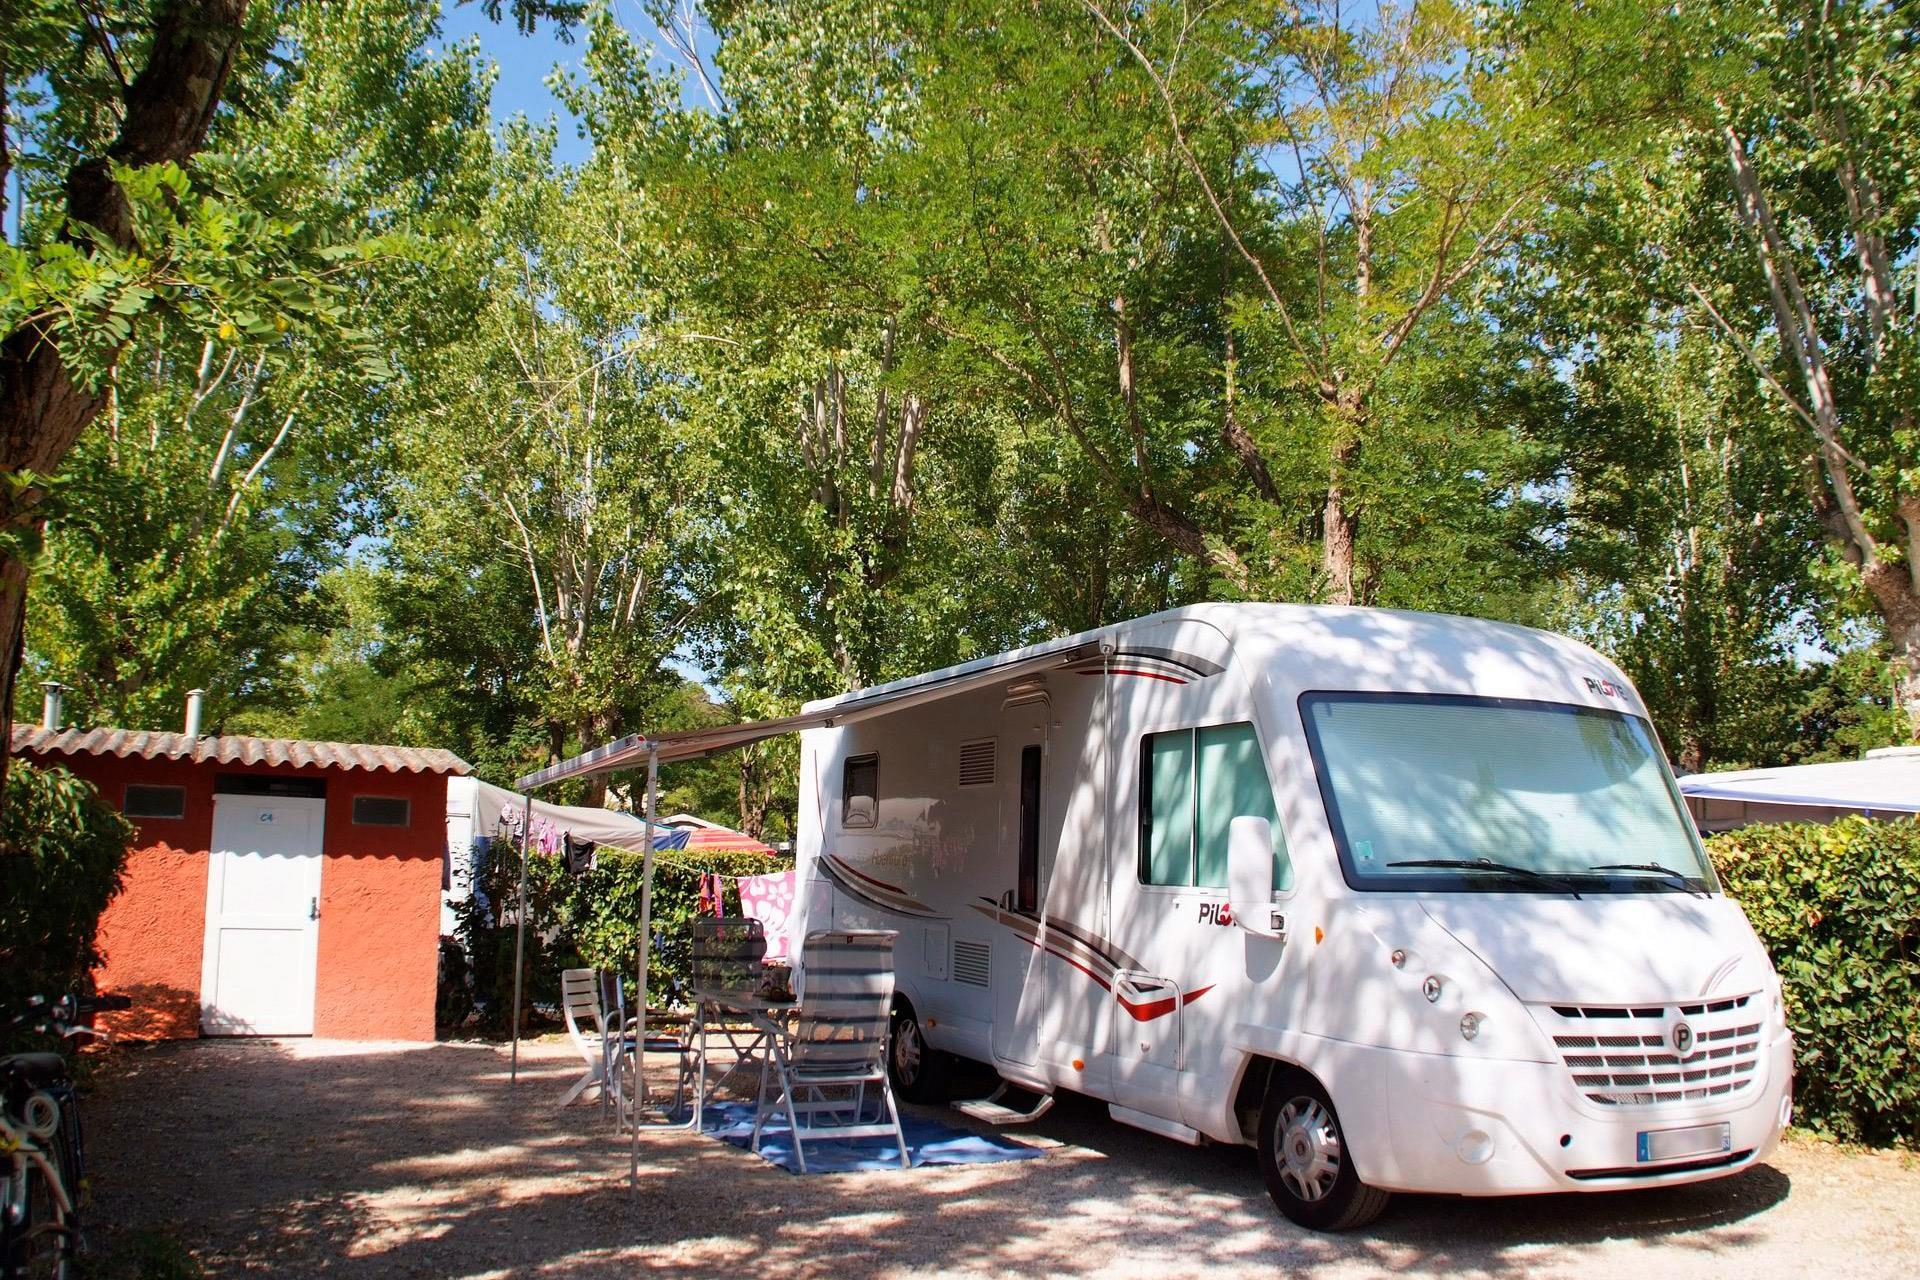 Emplacement - Emplacement *** (Sanitaires Privés) - Camping Sandaya Riviera d'Azur